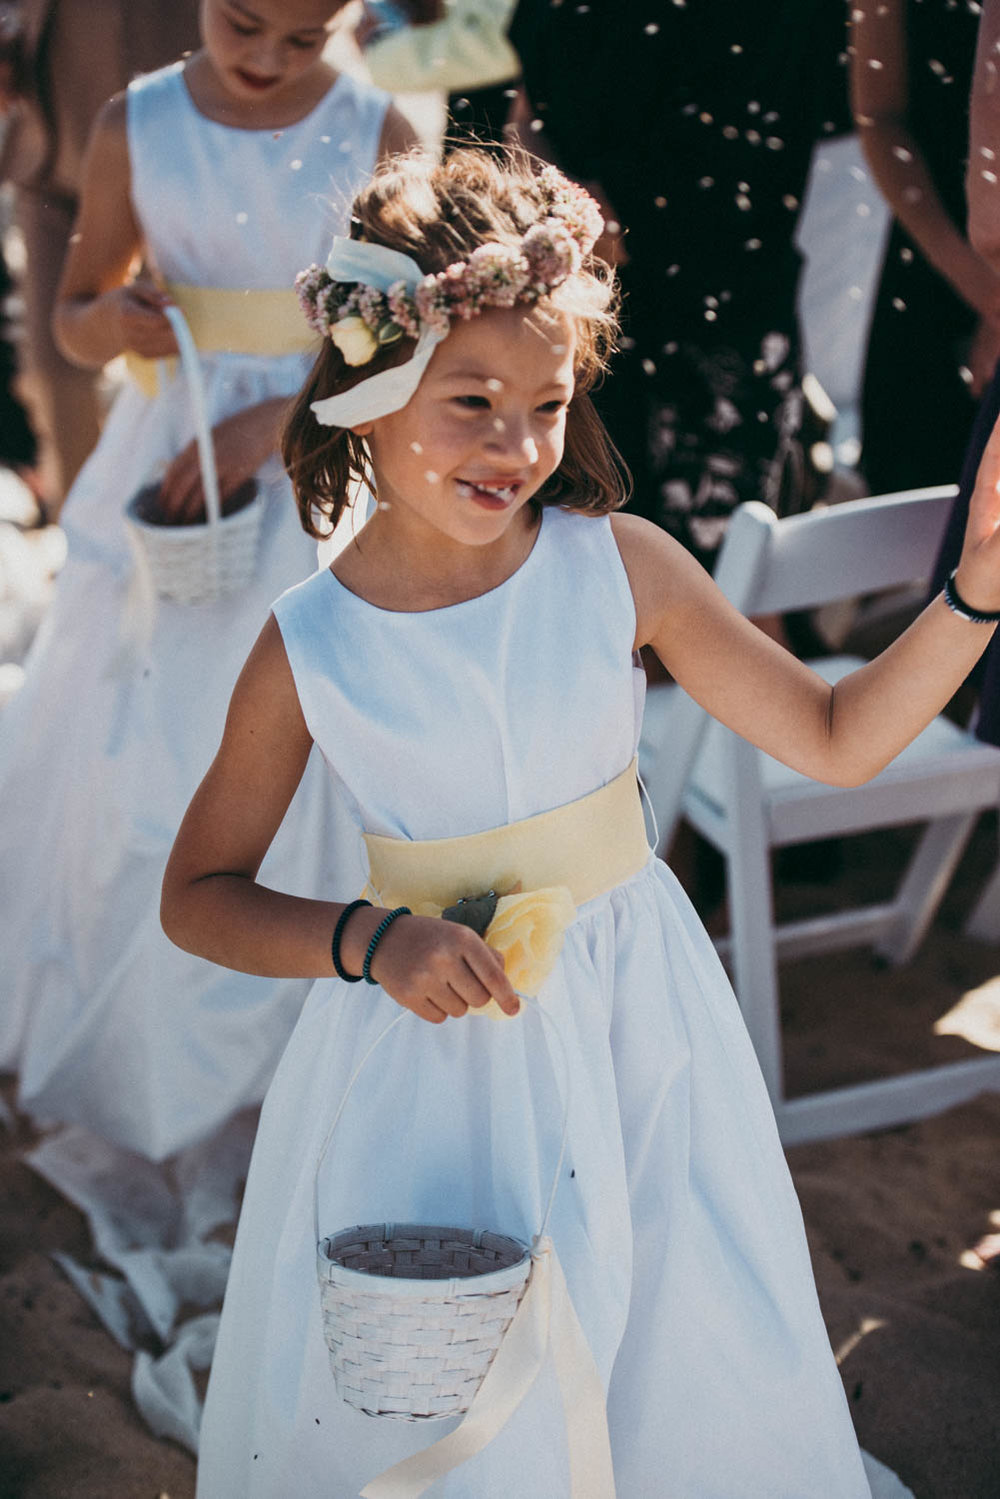 healy-wedding-photography15.jpg